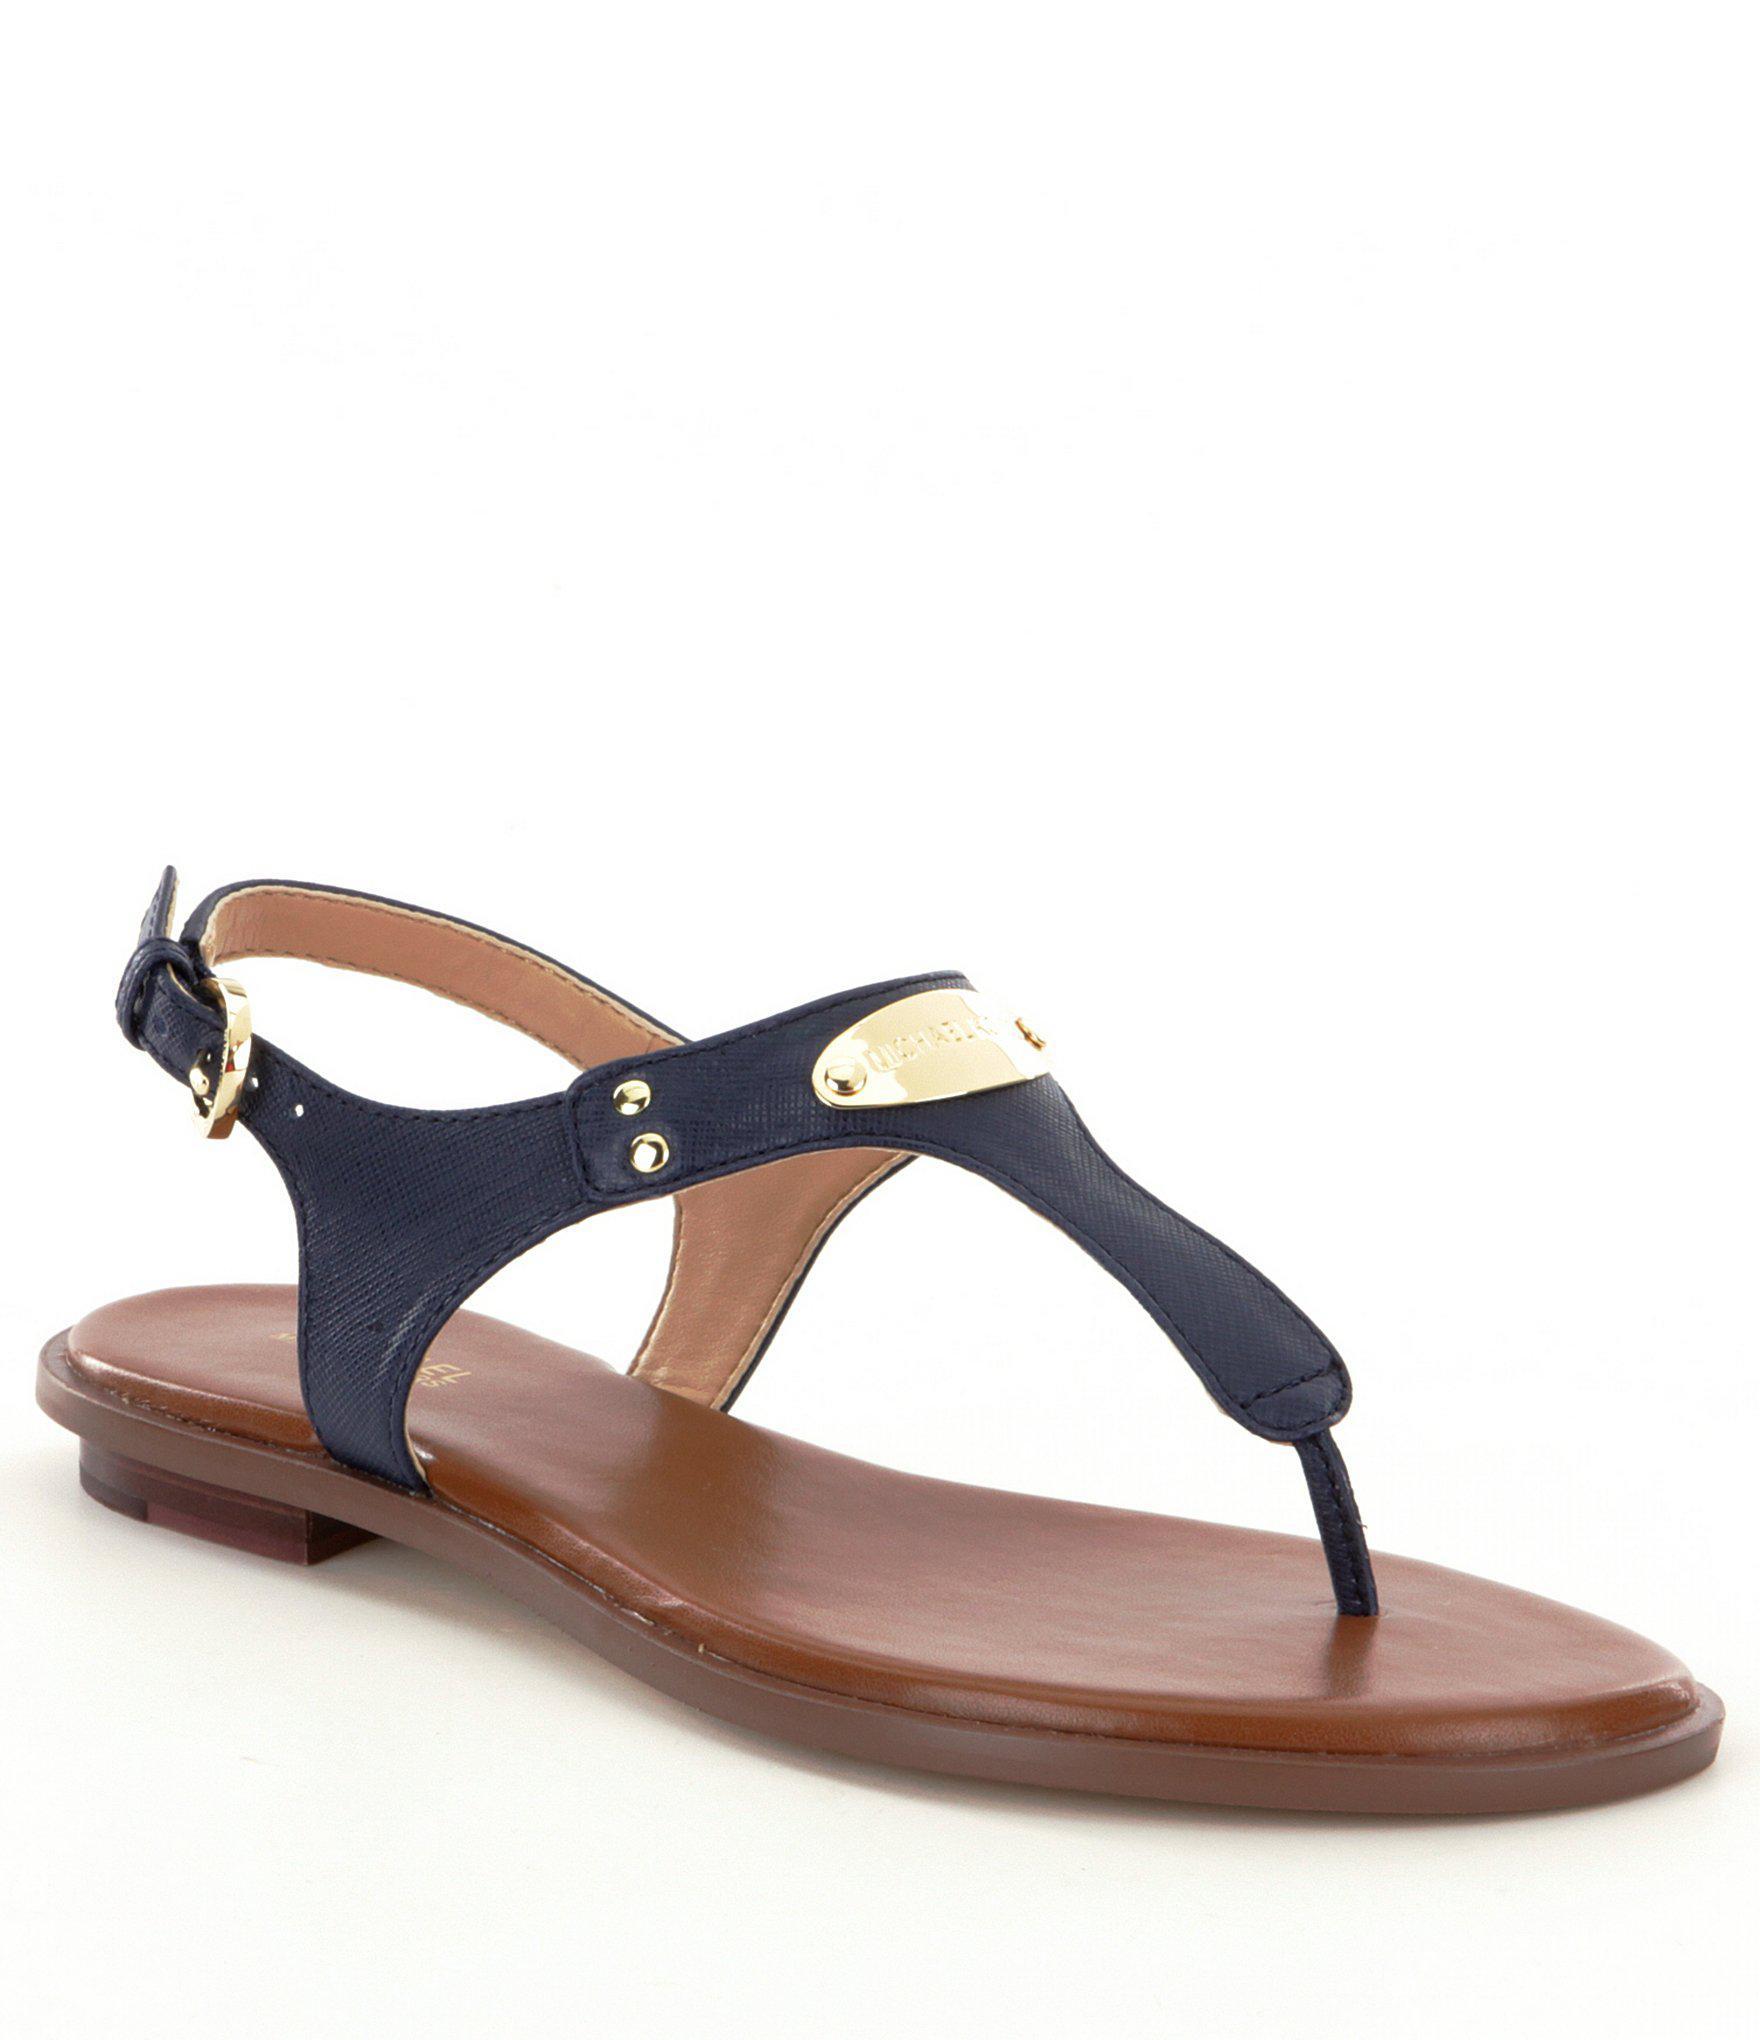 3007e2d603c Lyst - MICHAEL Michael Kors Mk Plate Sandals in Blue